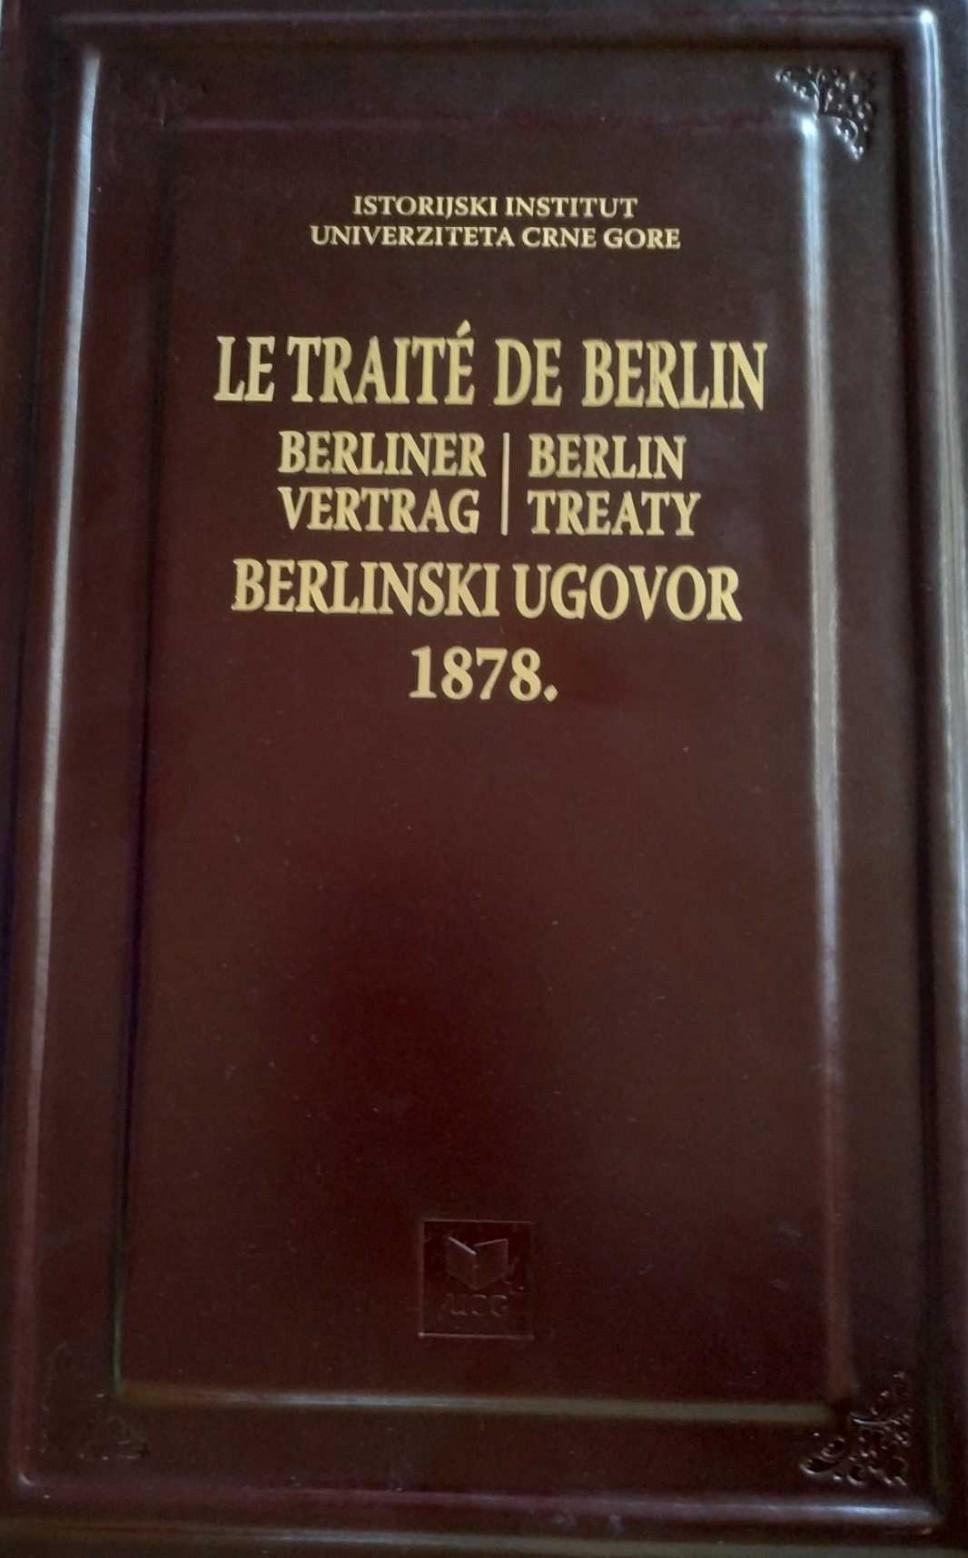 Berlinski ugovor 1878.